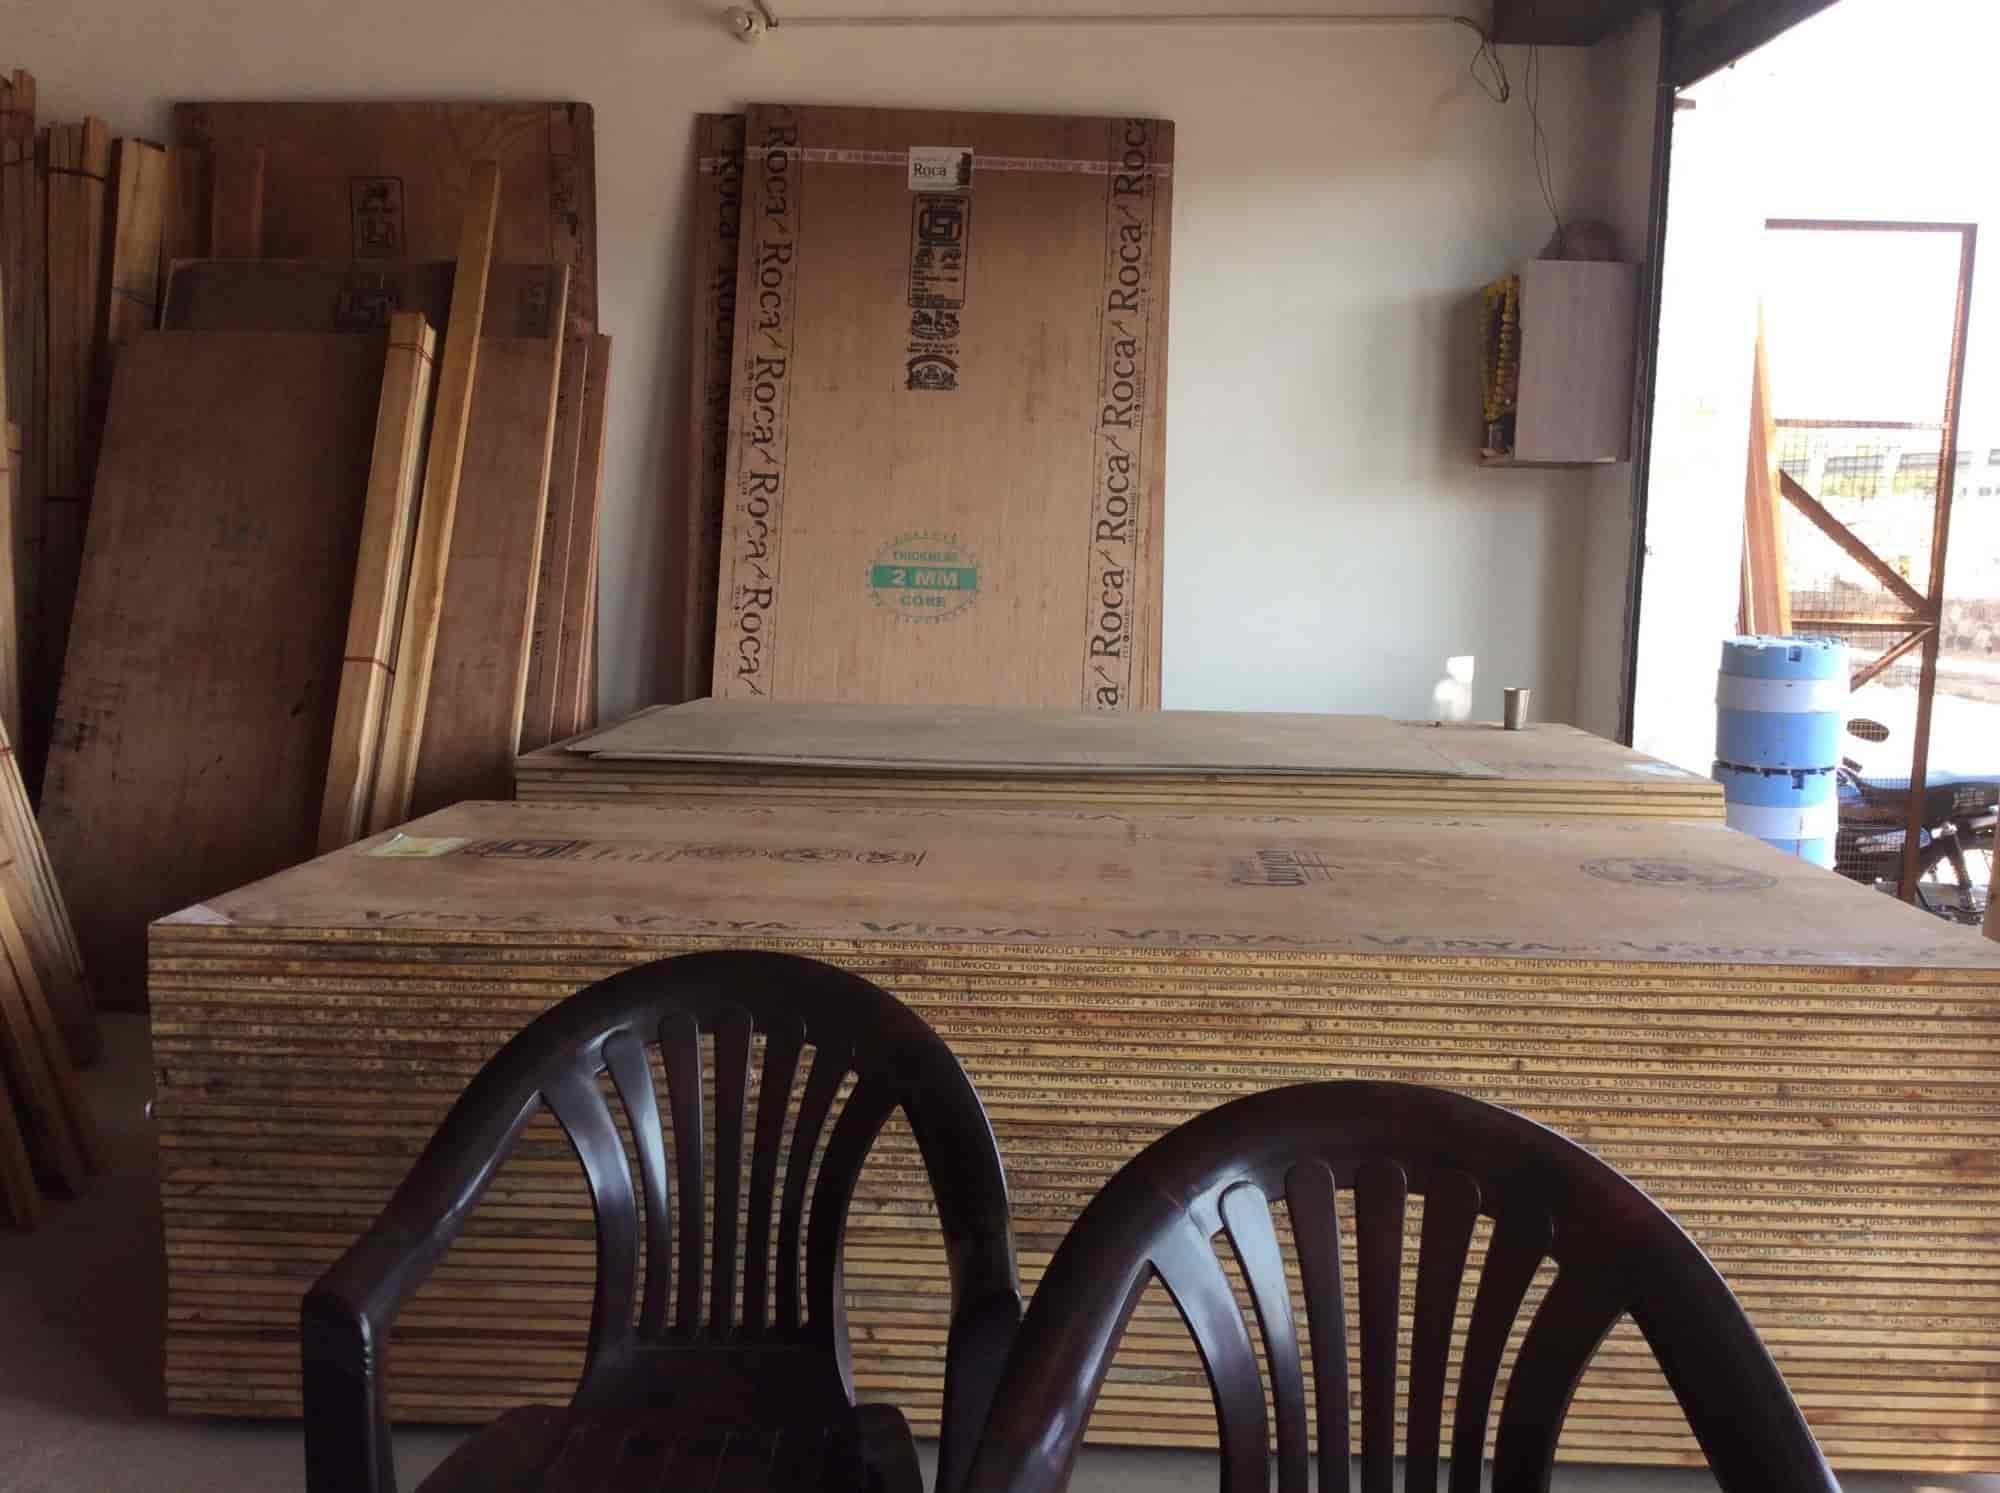 Shree Baba Timber & Plywood Chitrakoot Scheme Plywood Dealers